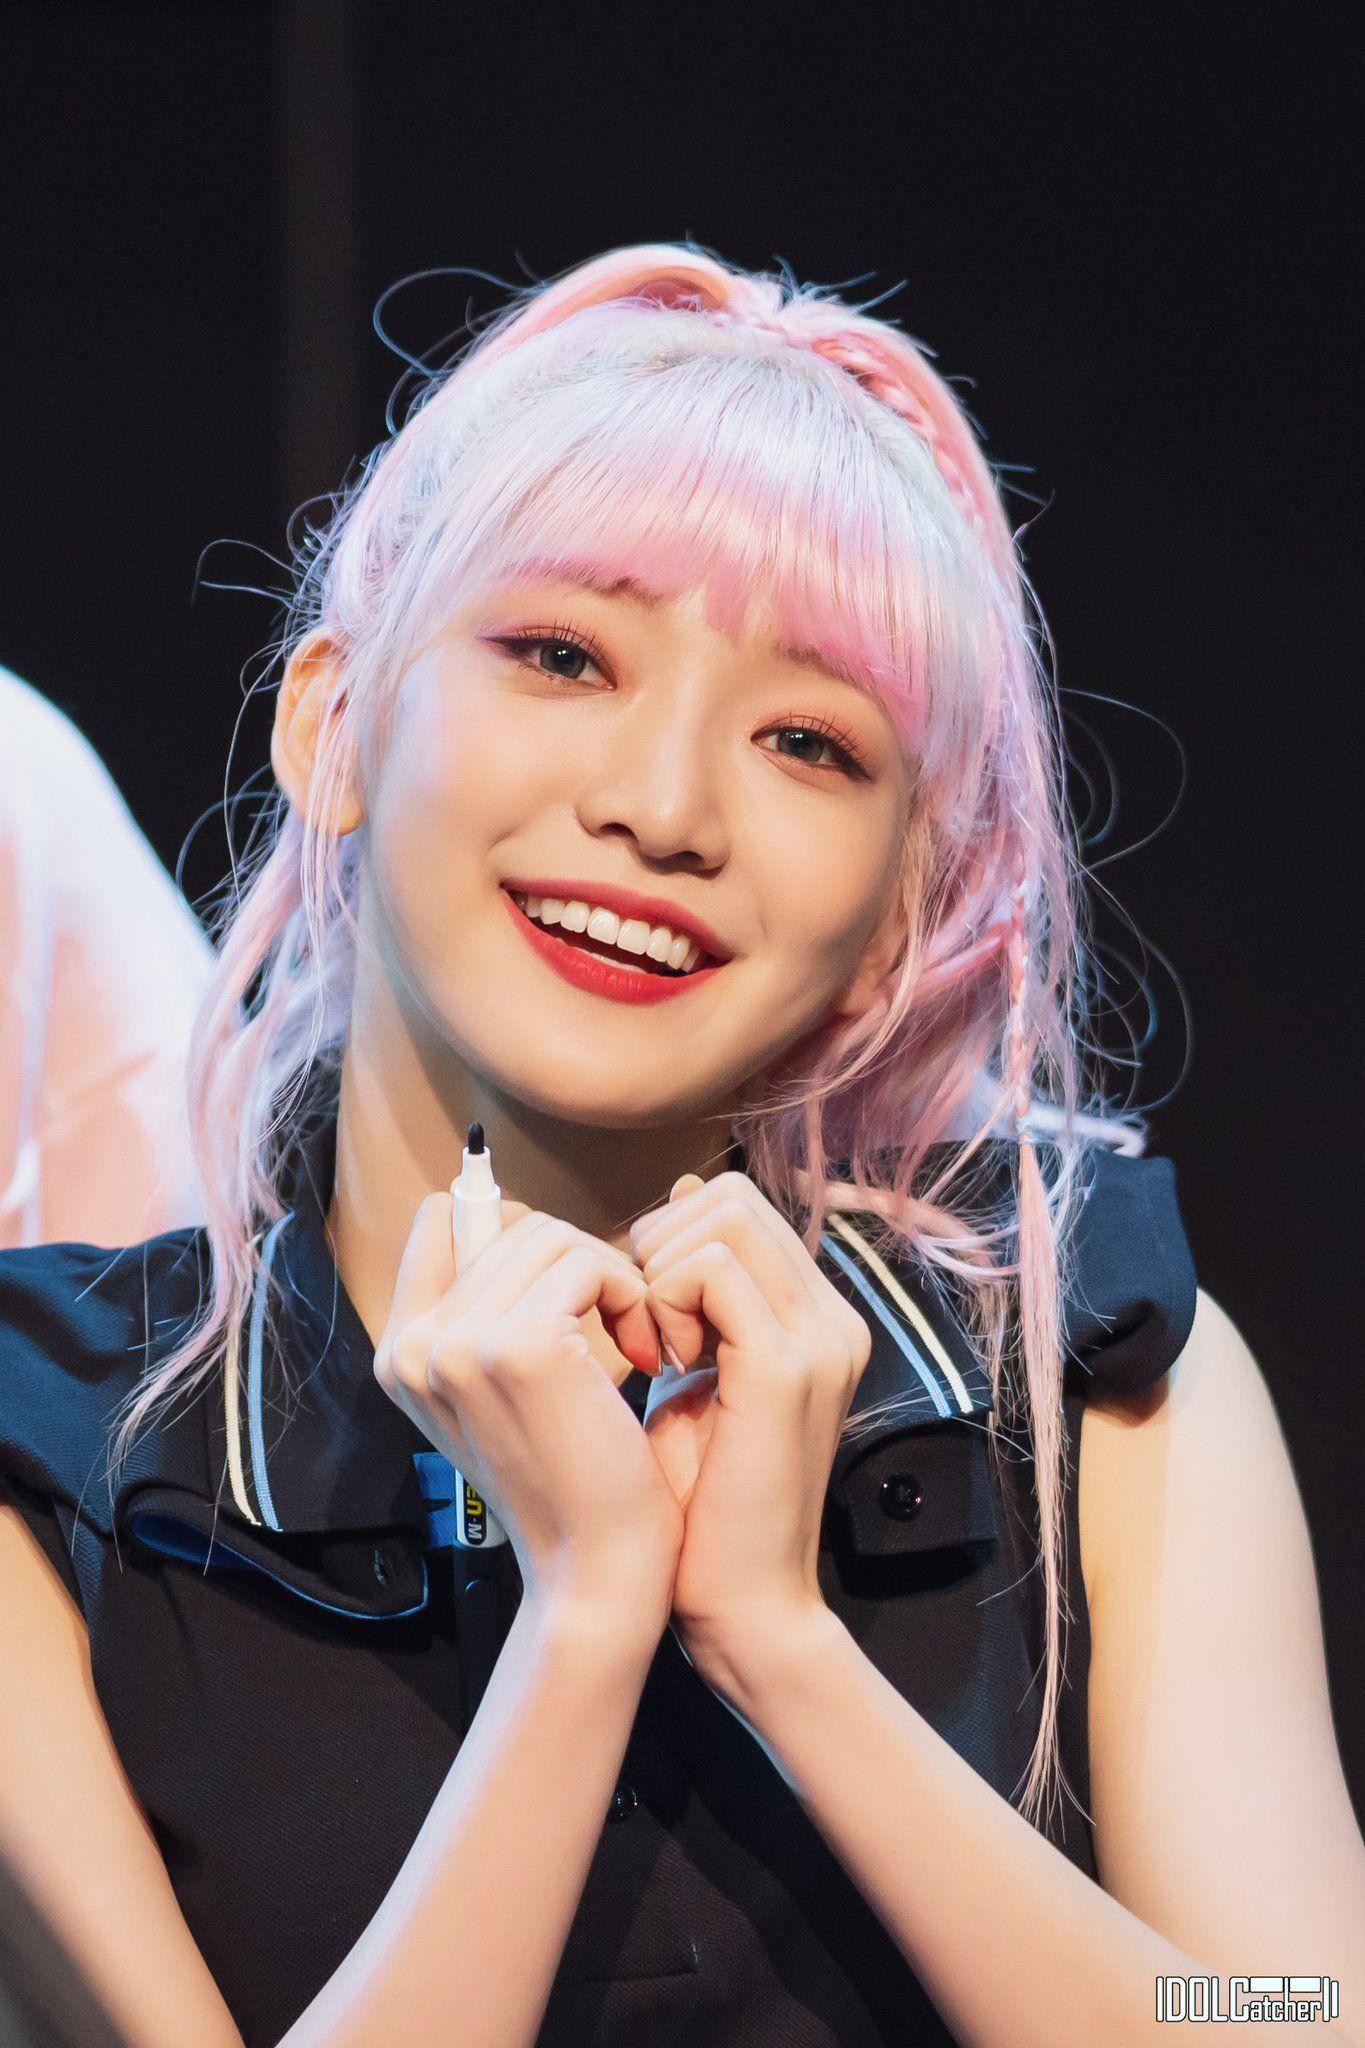 Onda Kpop Kdrama Bts Exo Kpoparmy Kpop Girl Groups Kpop Girls Onda